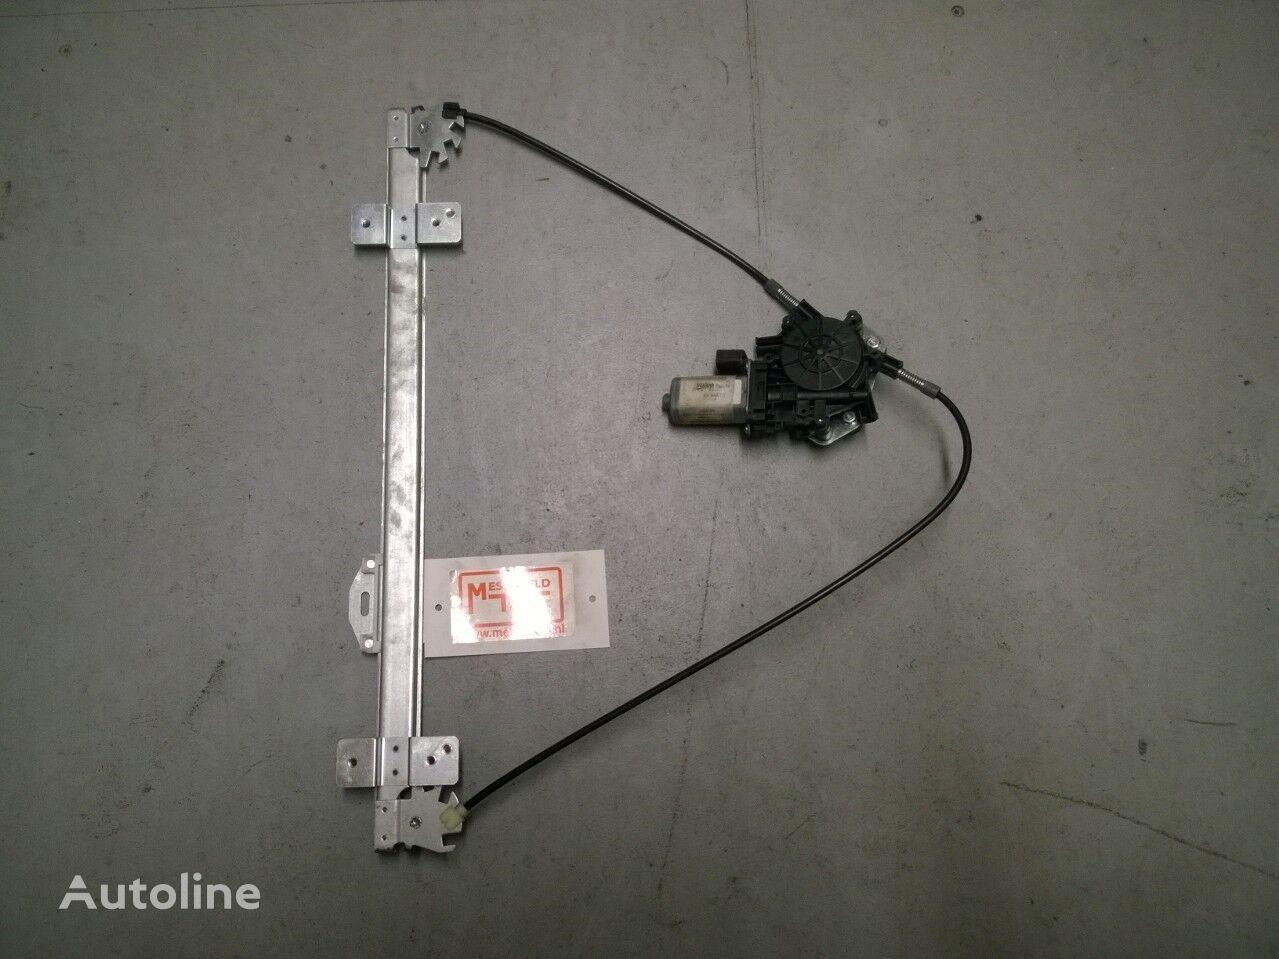 alzavetro manuale per trattore stradale DAF Raammechanisme 85CF nuovo